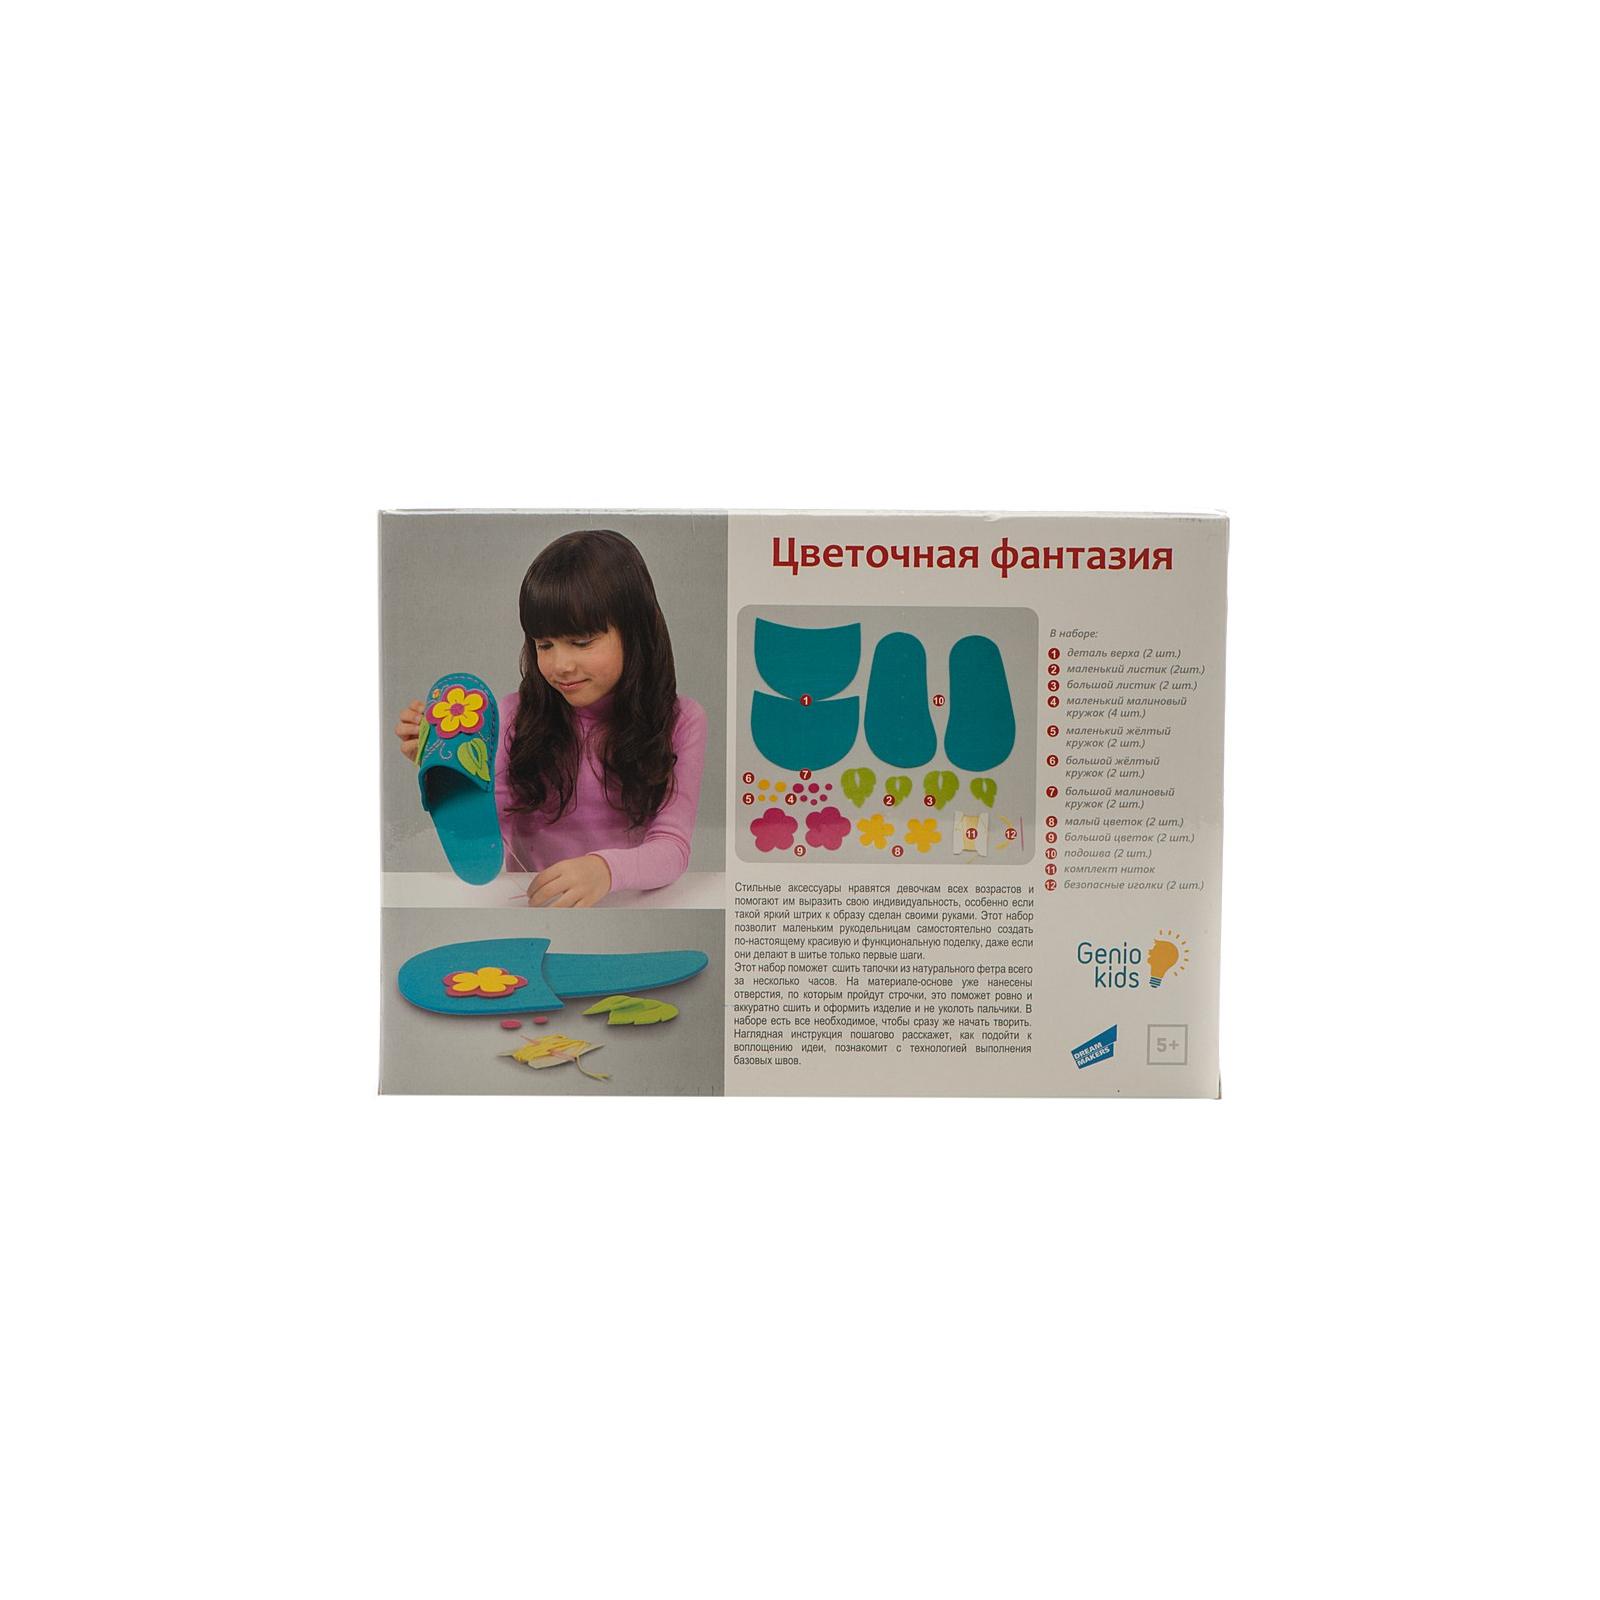 Набор для творчества GENIO KIDS Цветочная фантазия (FA03) изображение 2